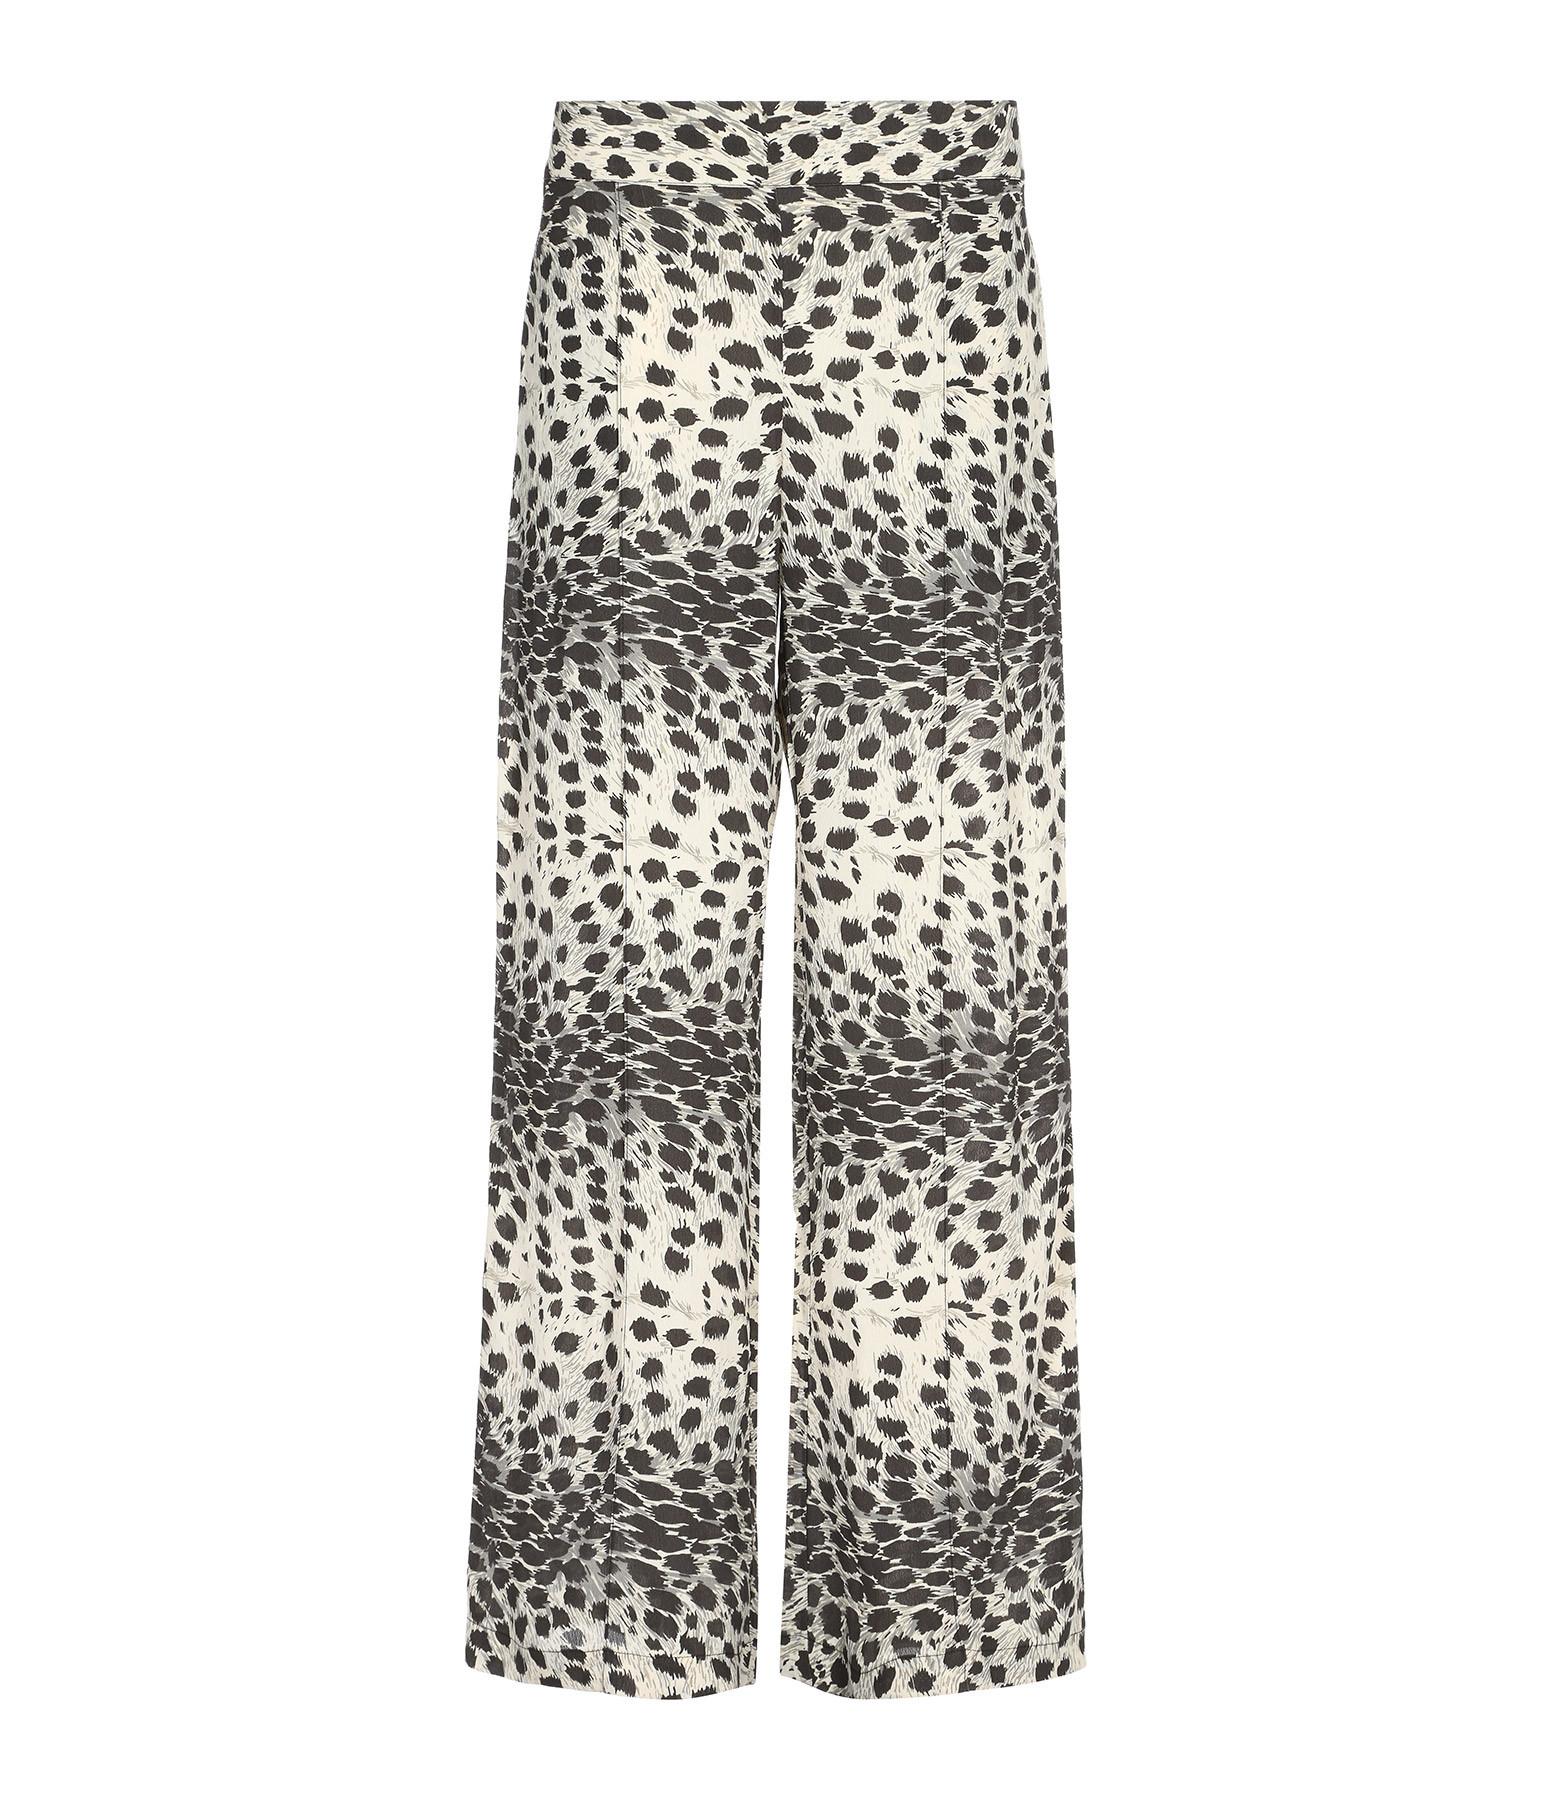 SEA NEW YORK - Pantalon Léopard Naturel